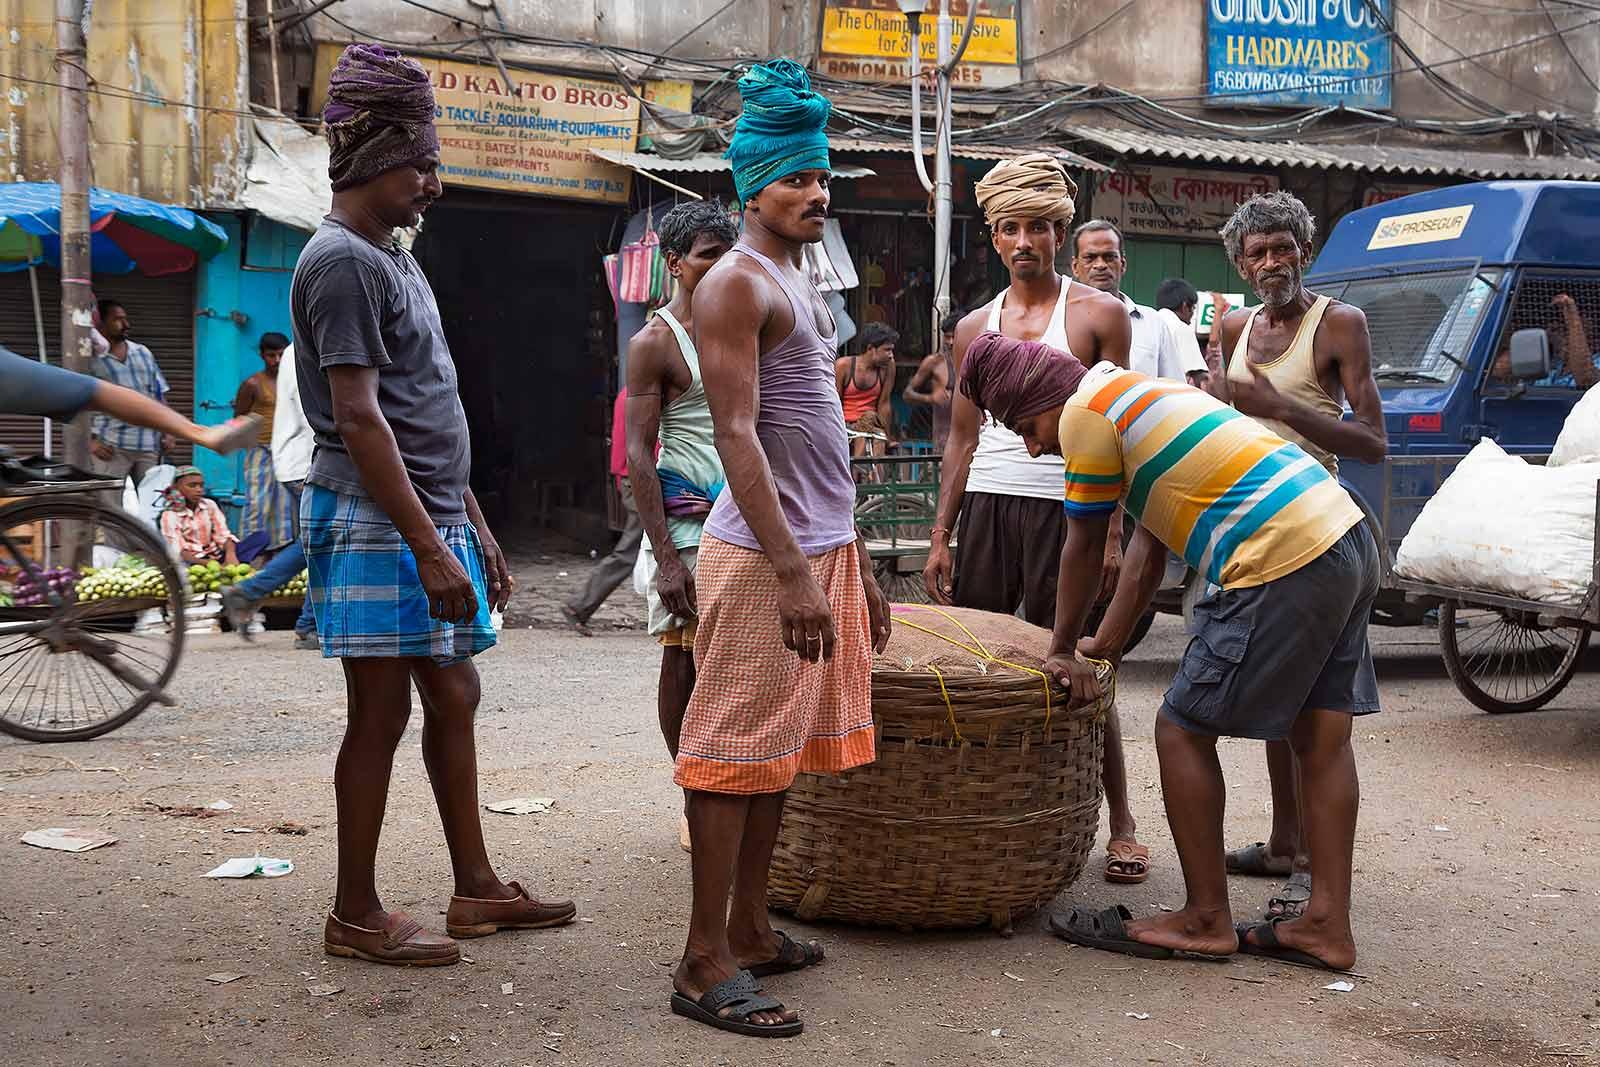 working-men-vegetable-market-kolkata-howrah-west-bengal-india